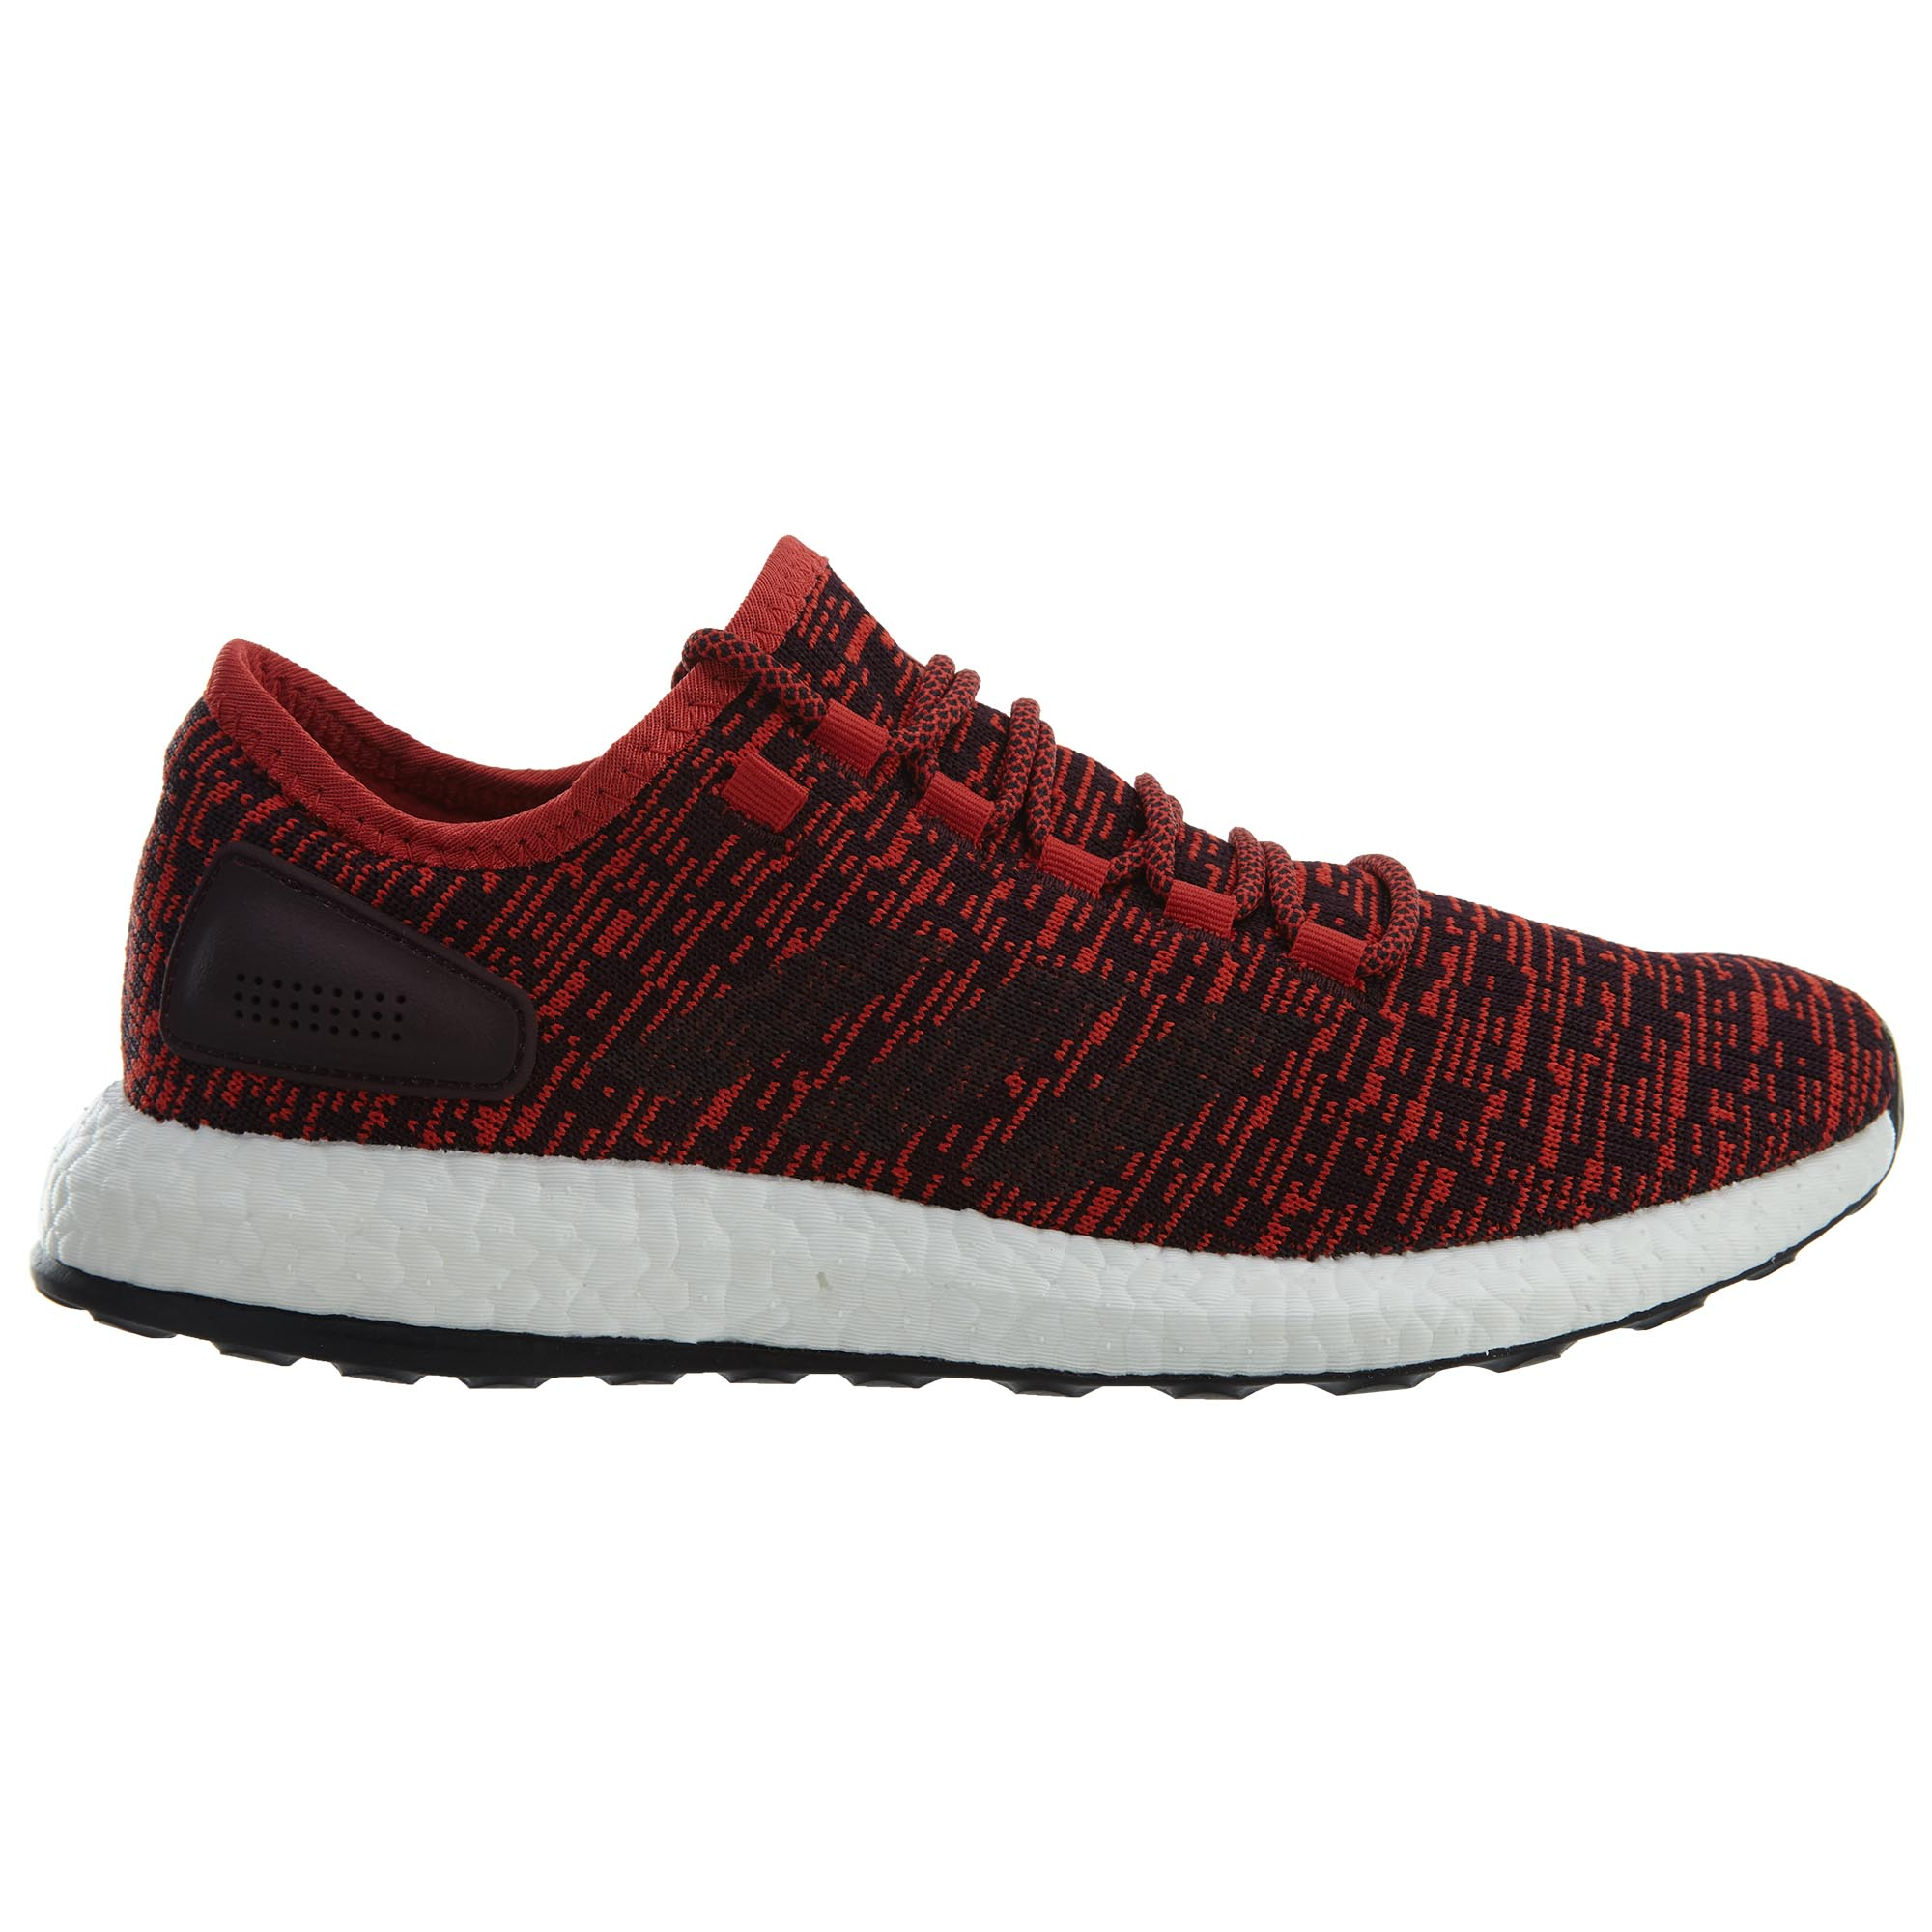 0a873bc1c99fc ... greece adidas pure boost tactile red dark burgundy black ccad7 f4ddf